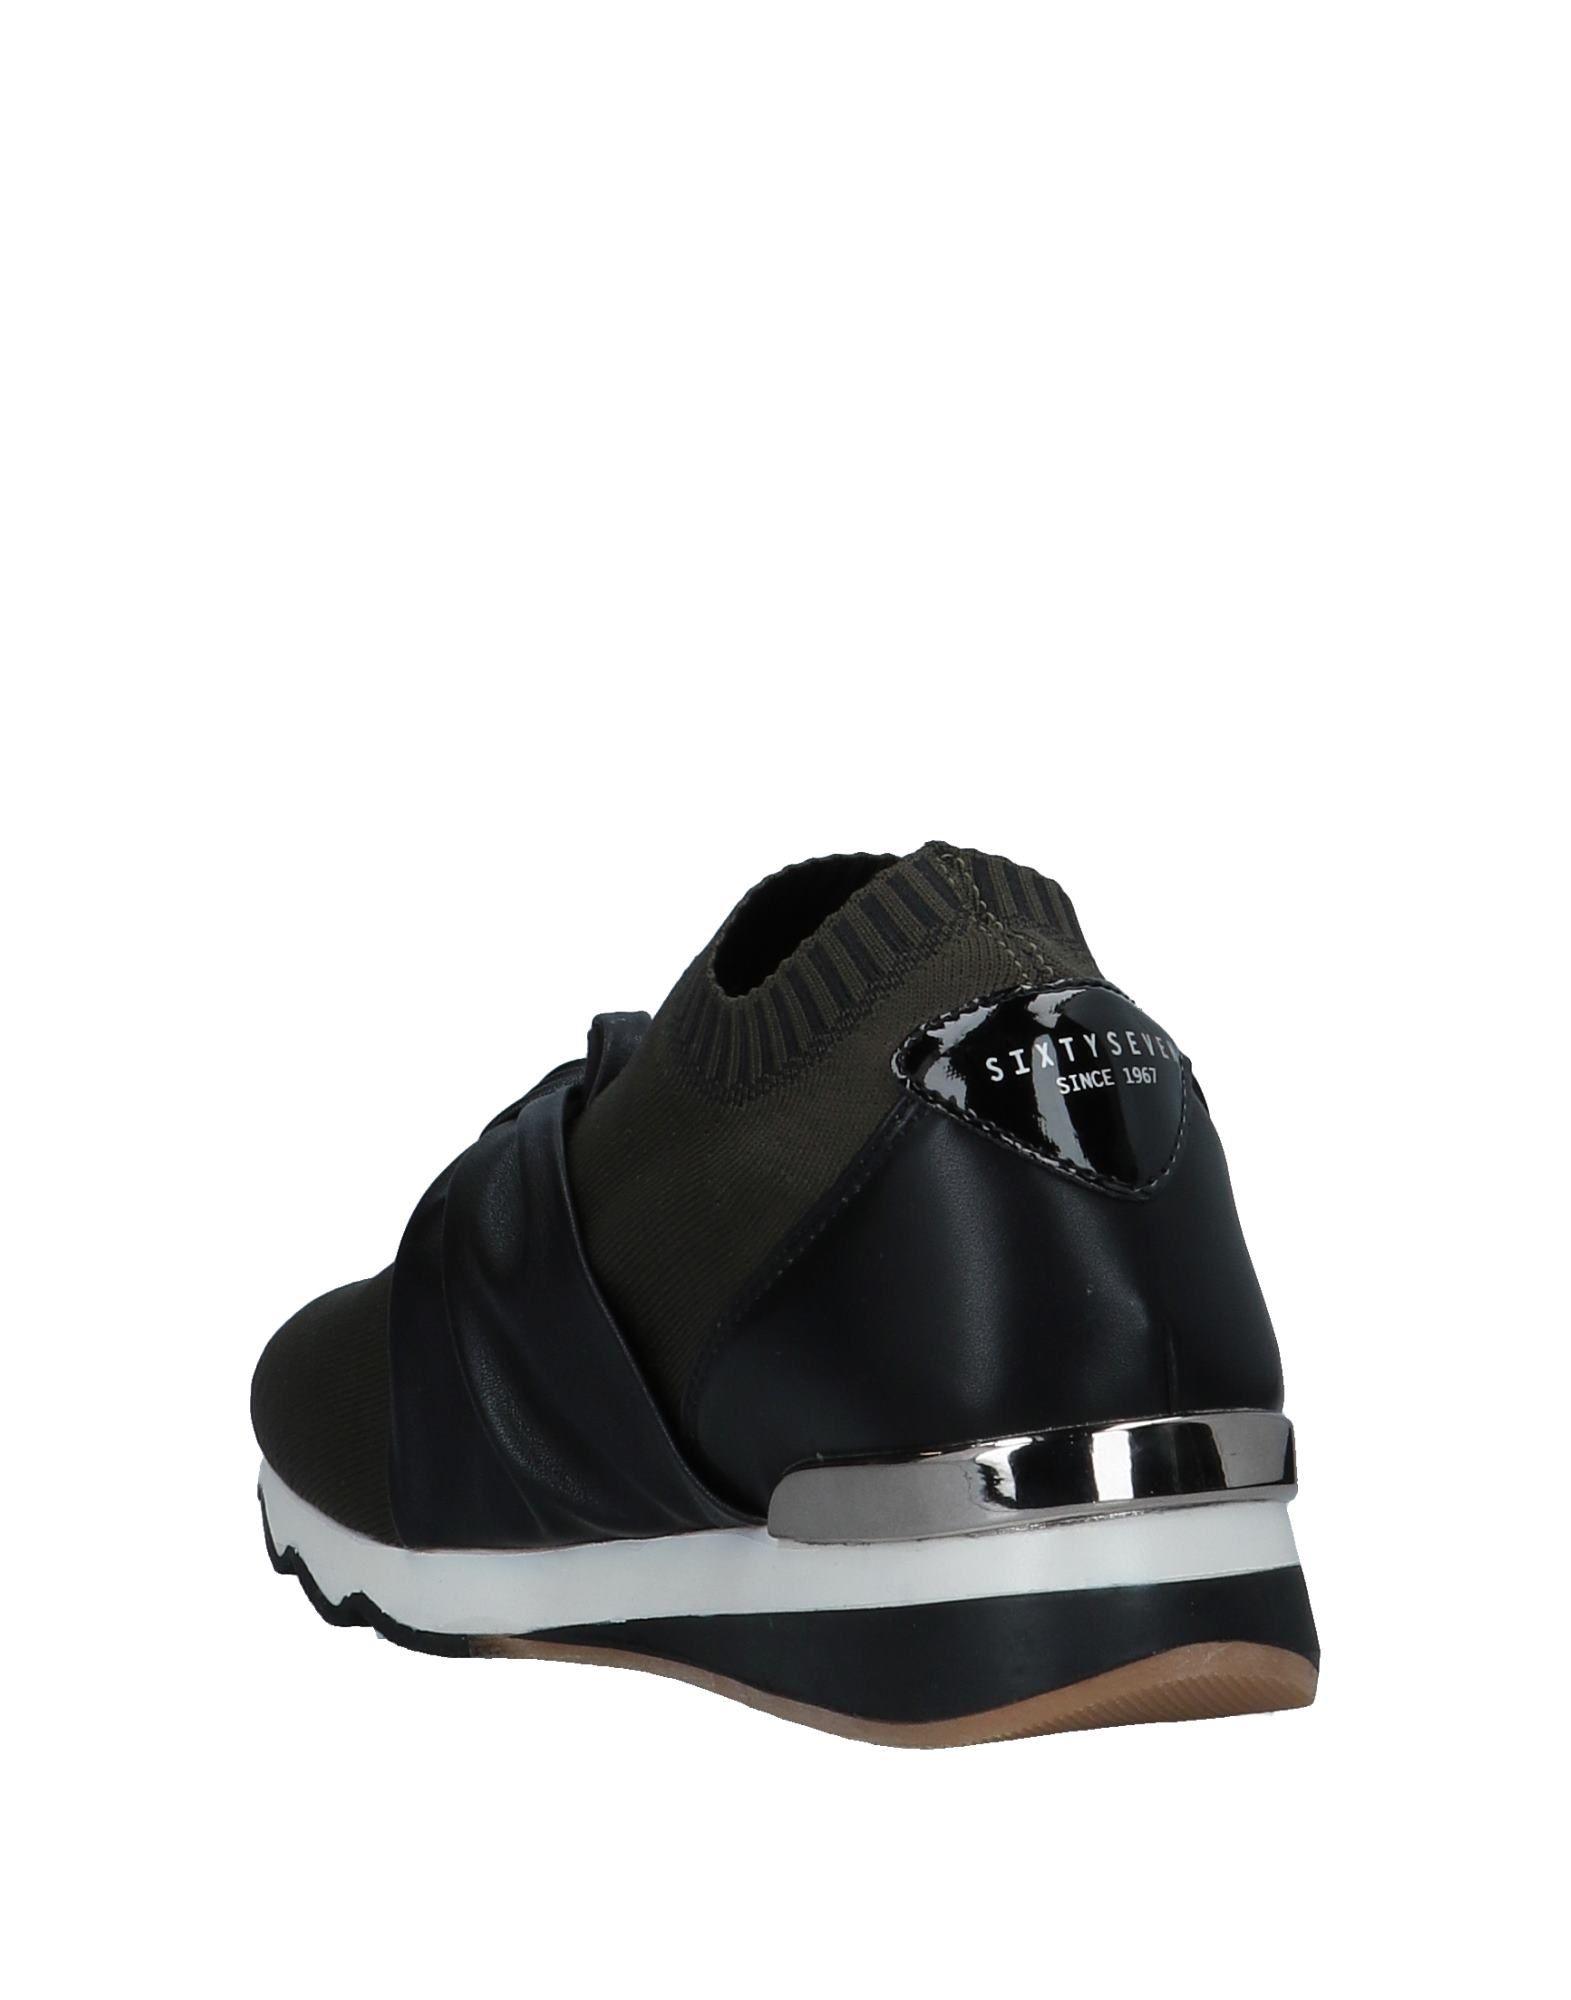 19bcc605db2ddd ... 67 11544601OM Sixtyseven Sneakers Damen 11544601OM 67 Gute Qualität  beliebte Schuhe 1749b7 ...